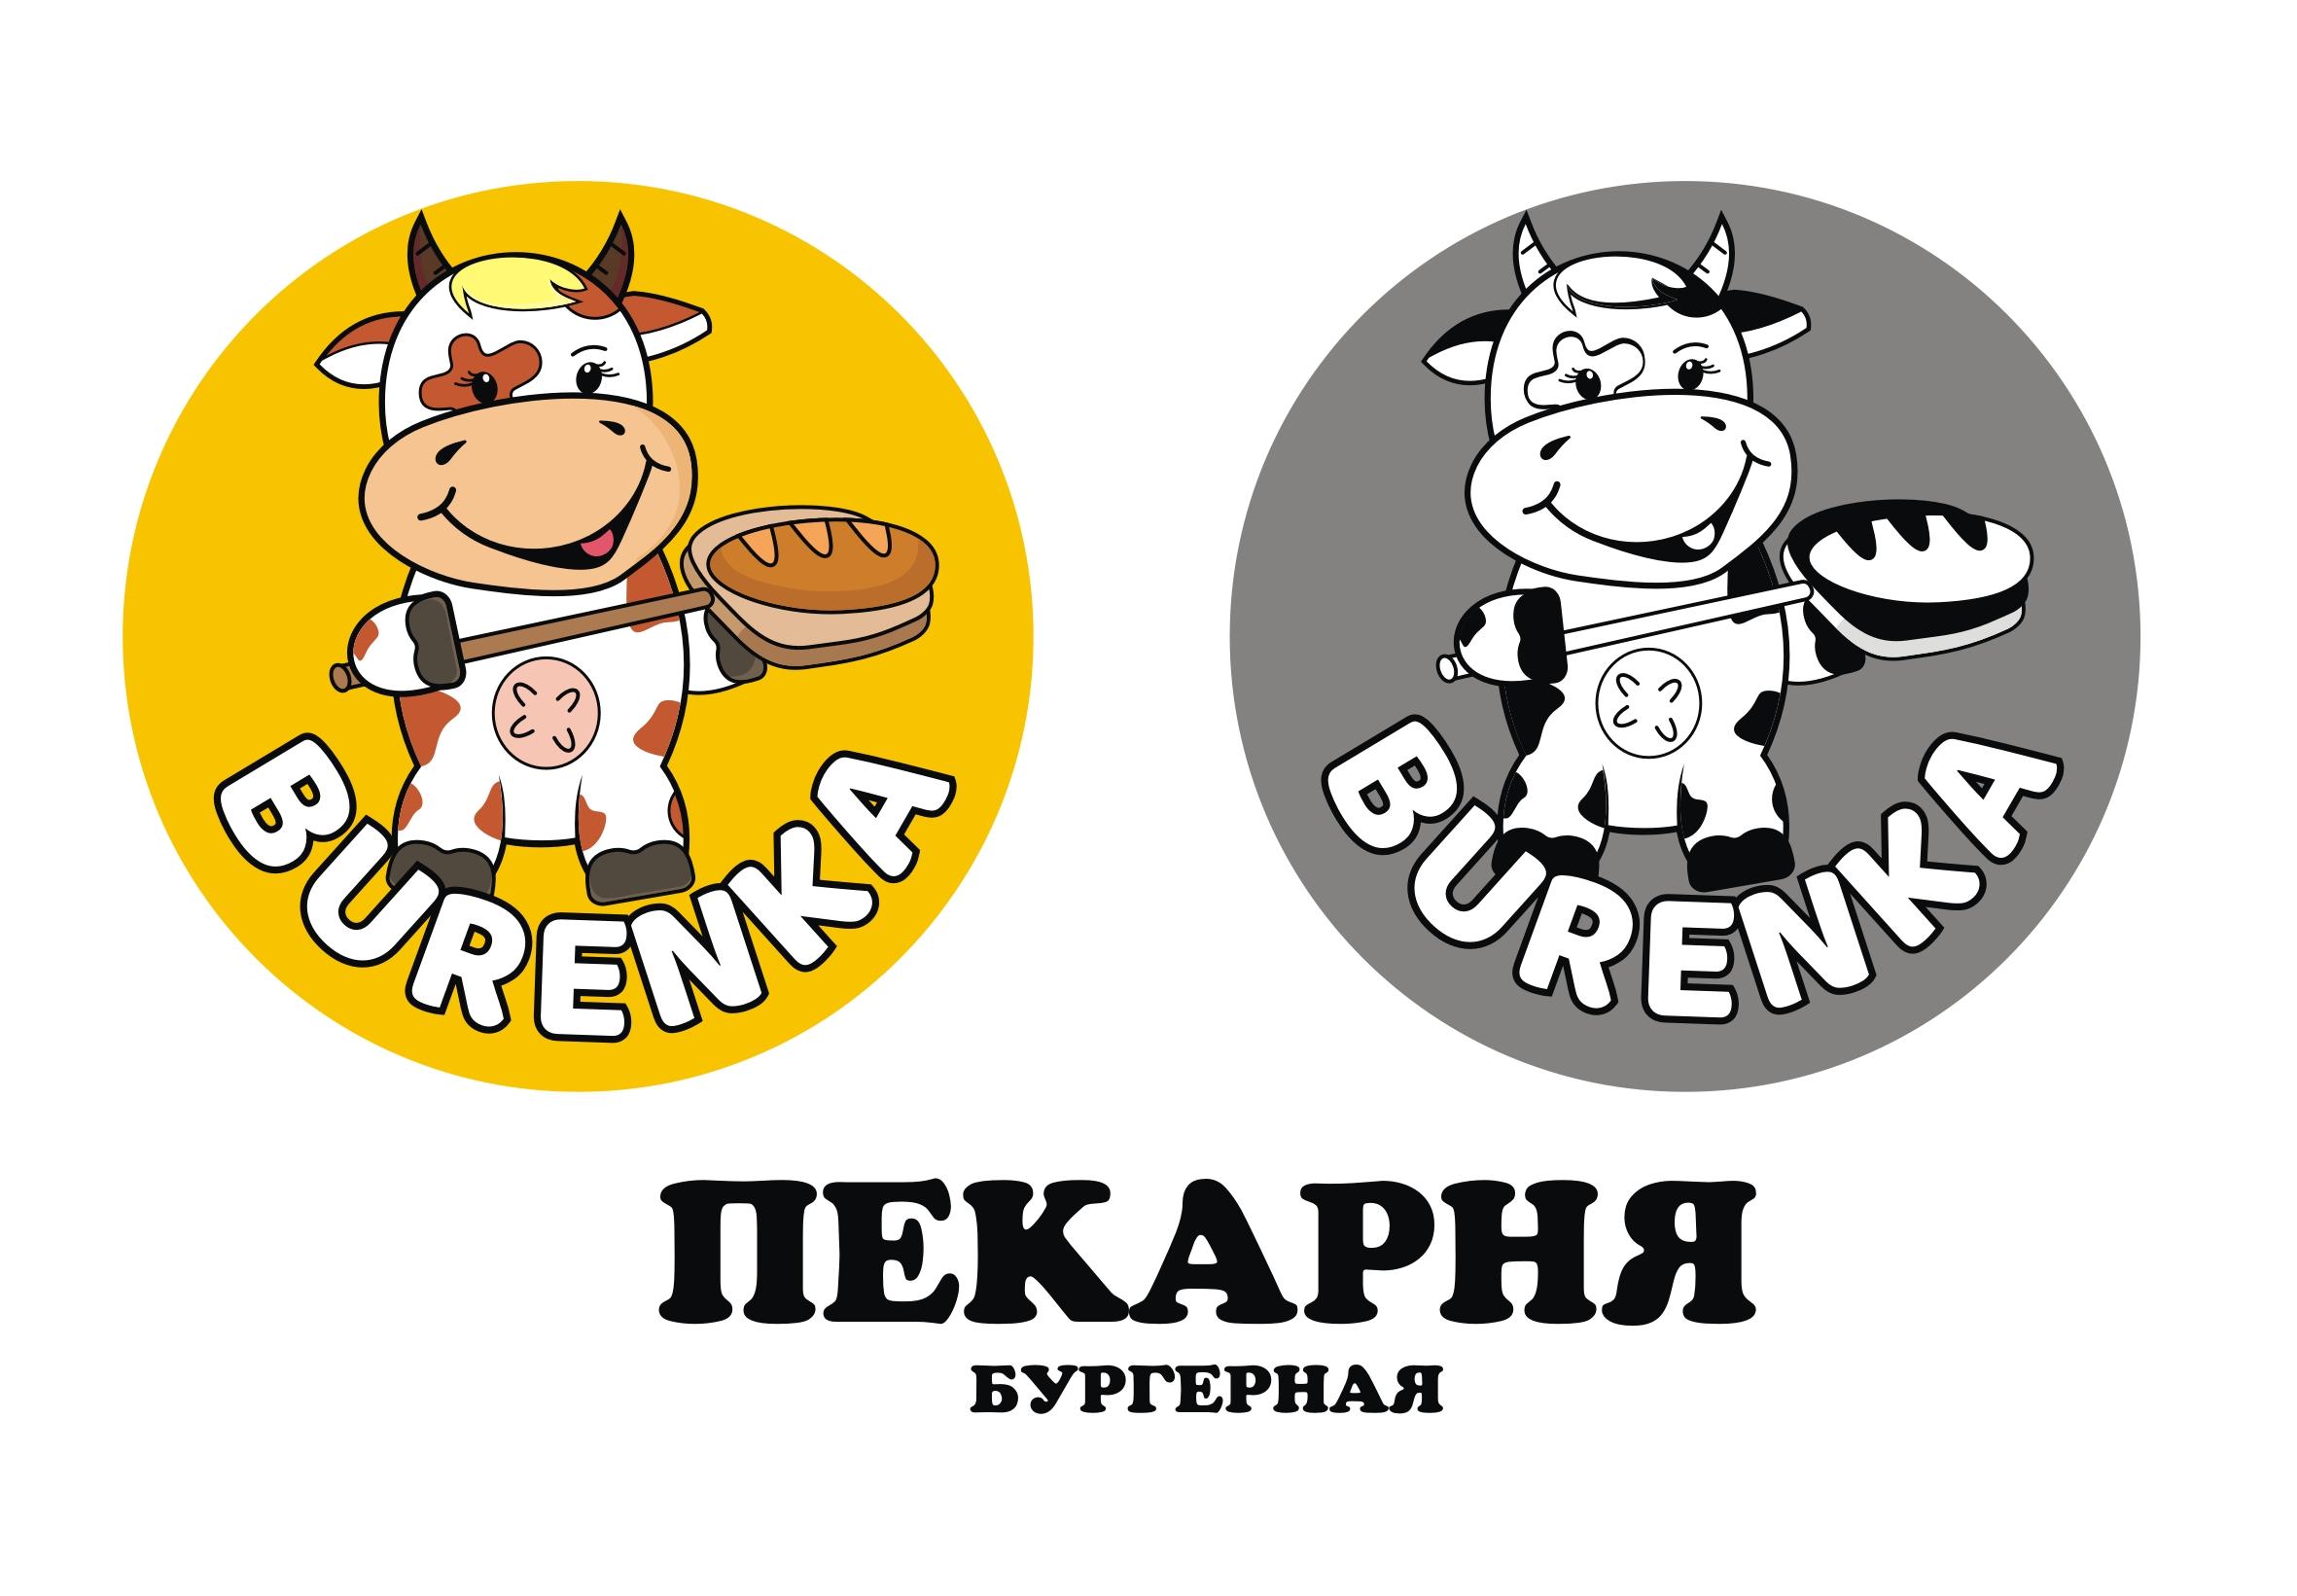 Логотип для Бургерной с Пекарней фото f_1975e1a4f97a8e50.jpg